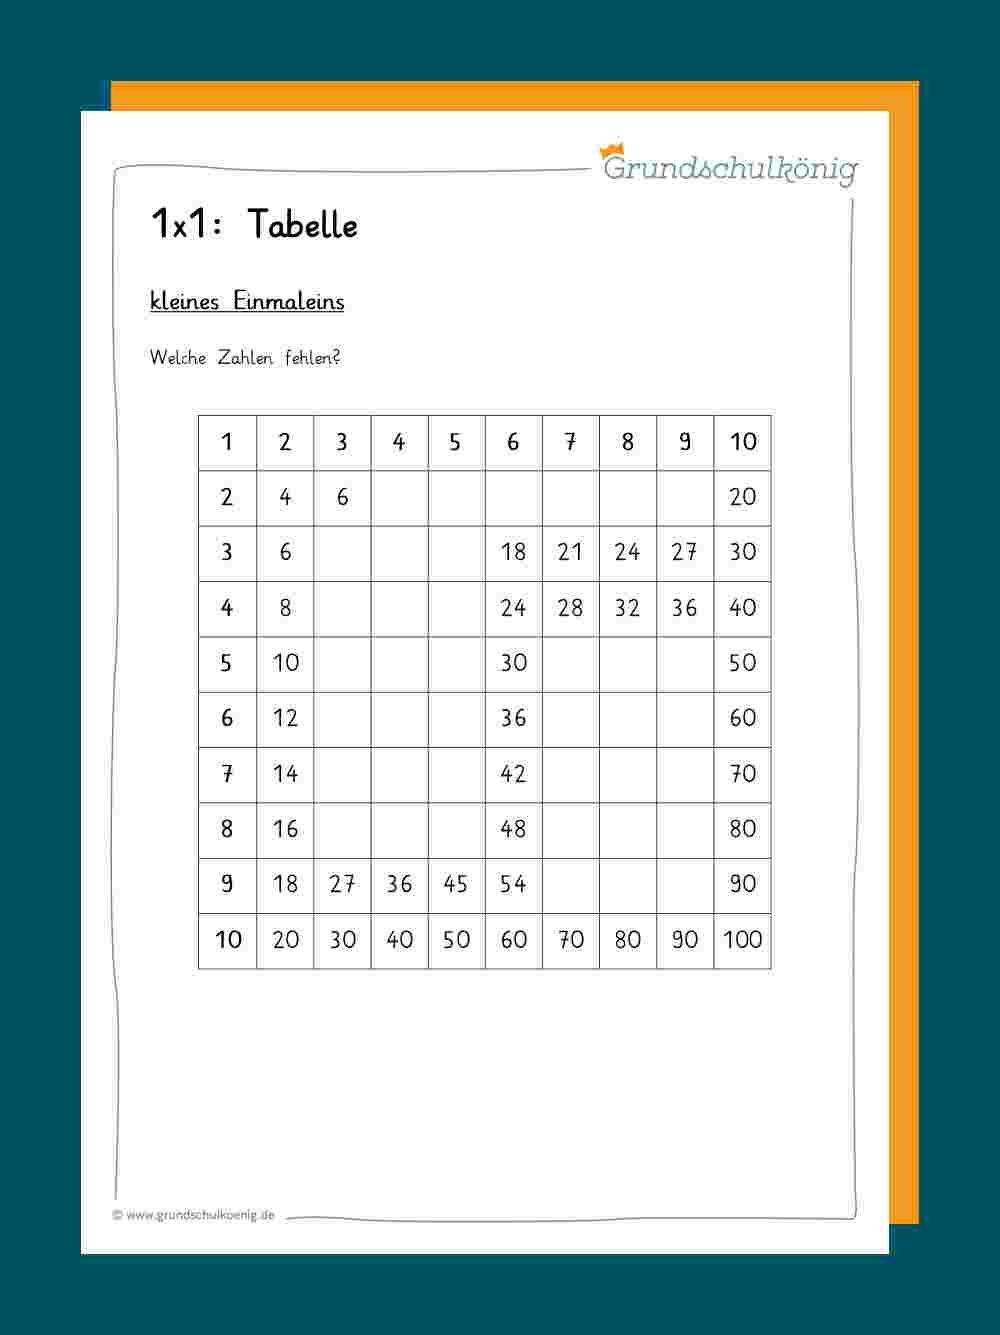 1x1-Tabelle in 2020 | Tabelle, Kleines einmaleins, Mathe